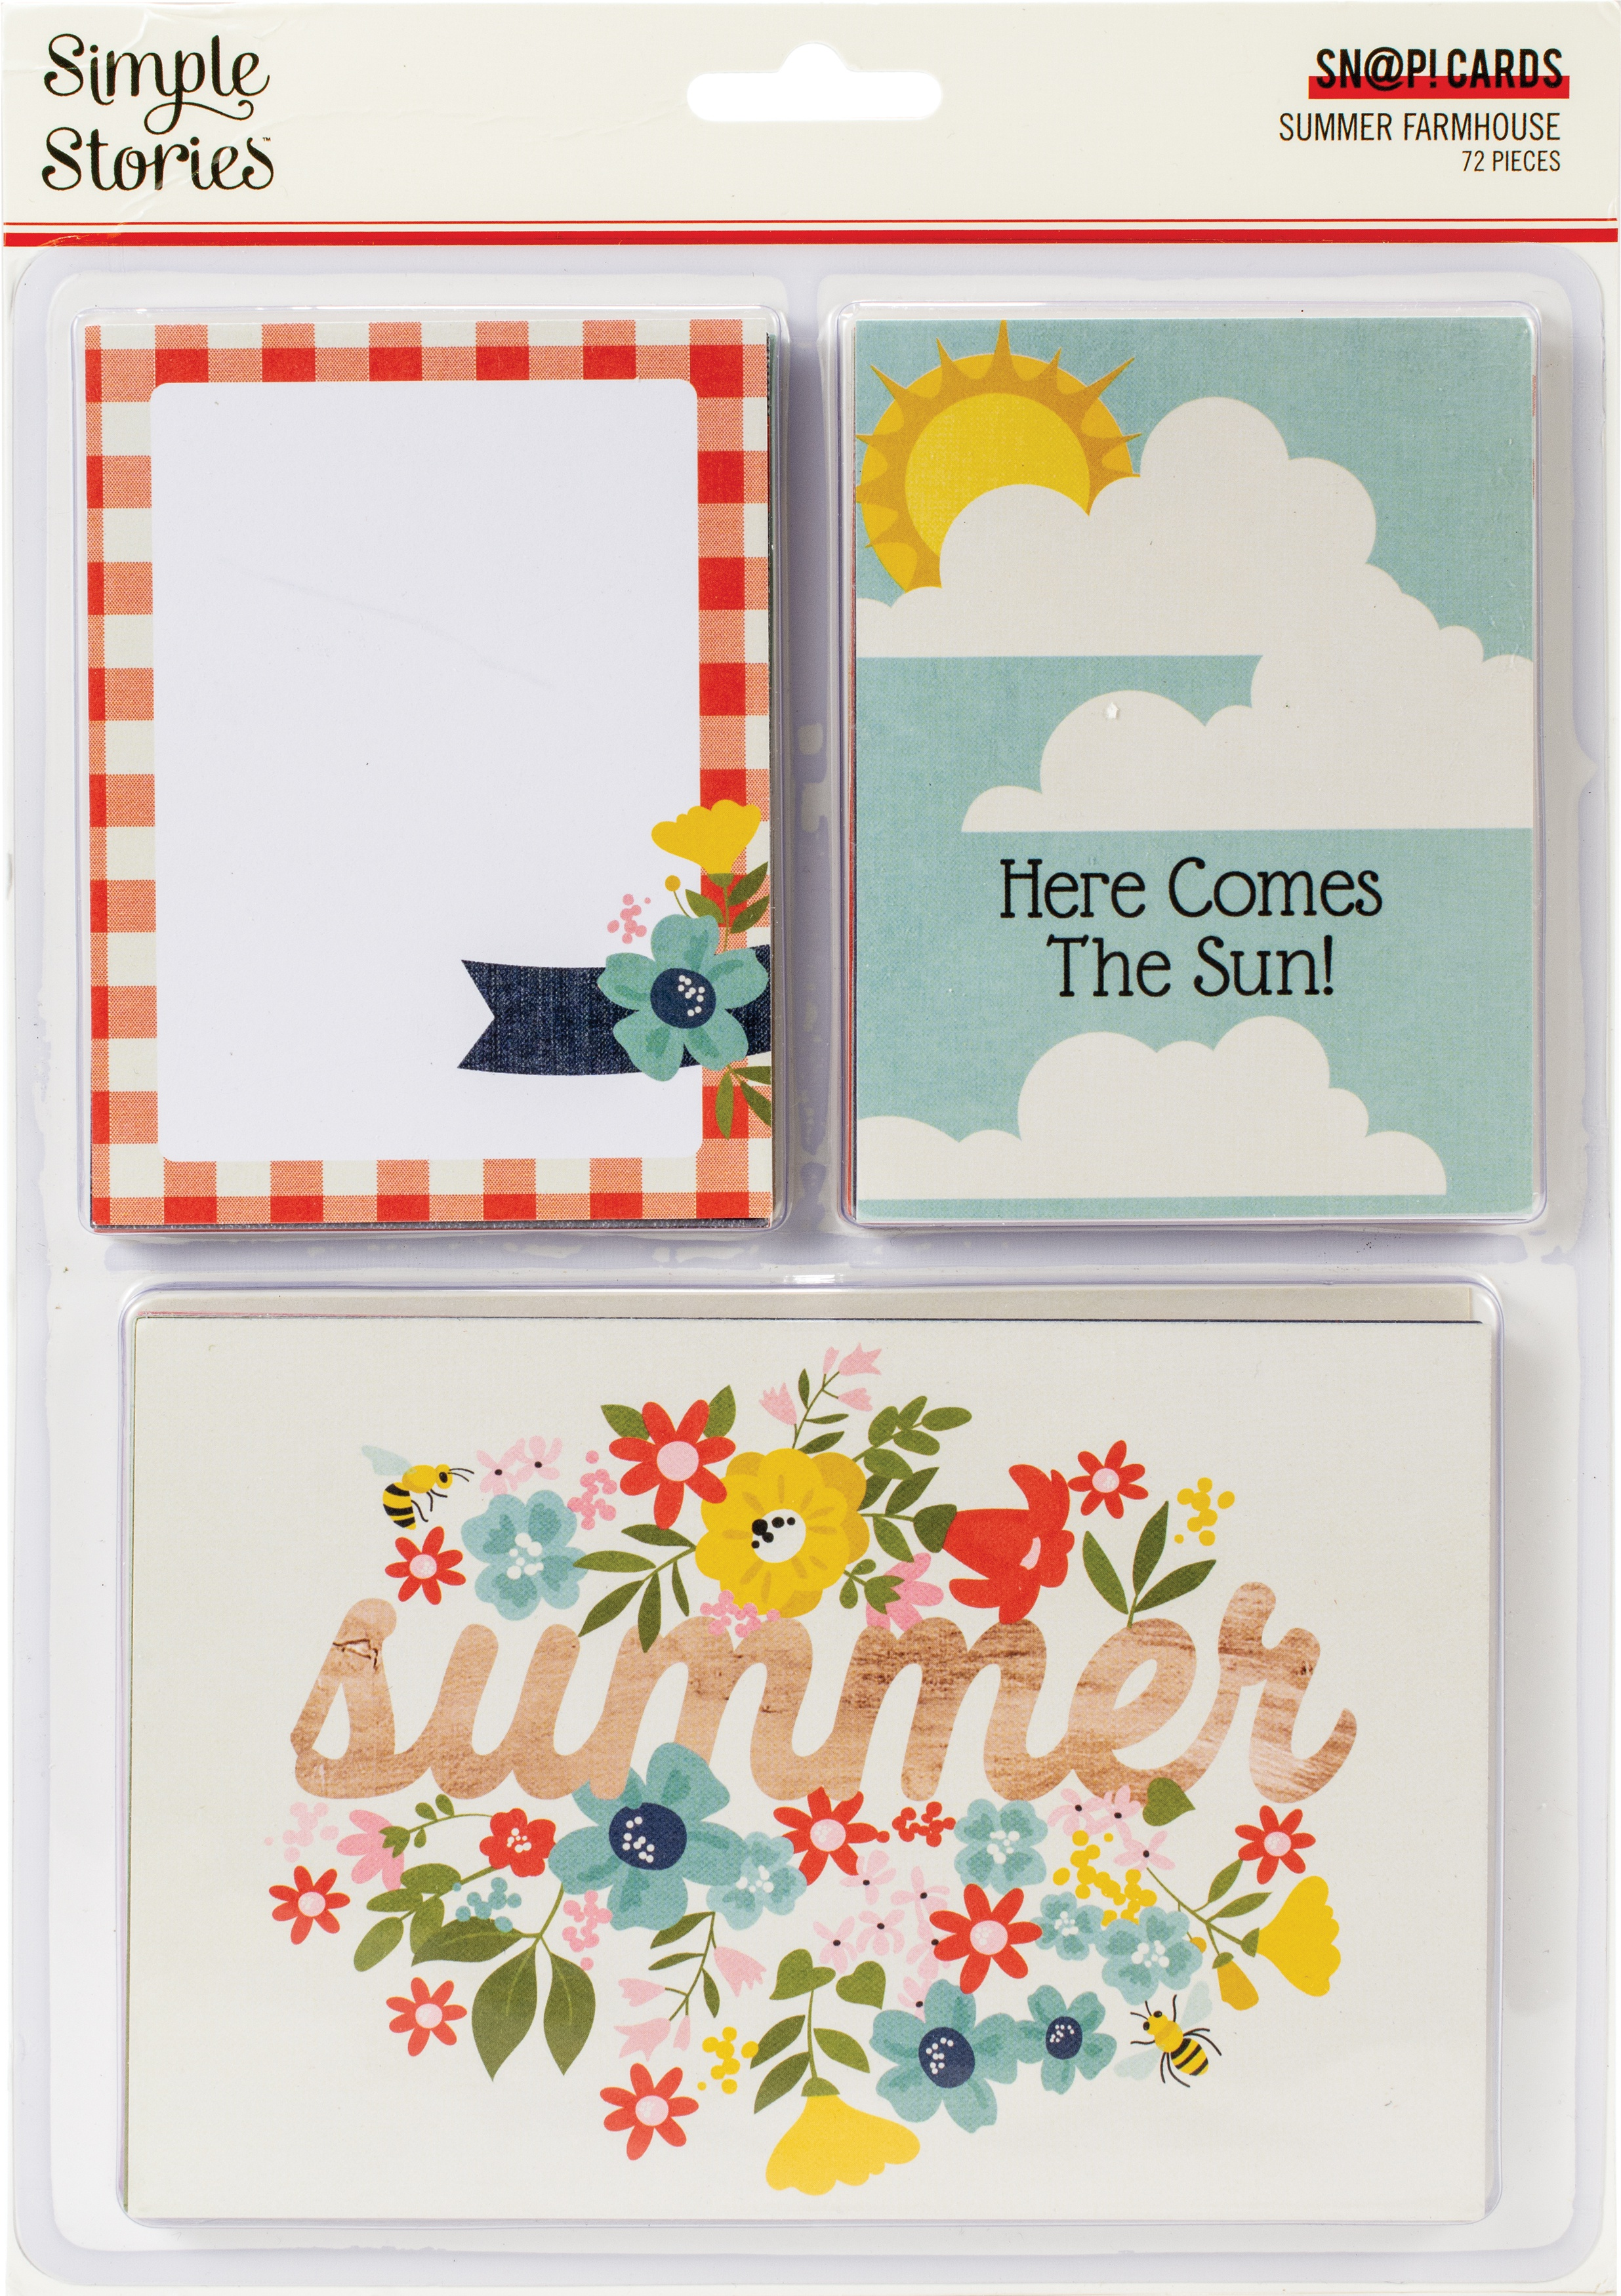 Simple Stories Sn@p! Card Pack 72/Pkg-Summer Farmhouse